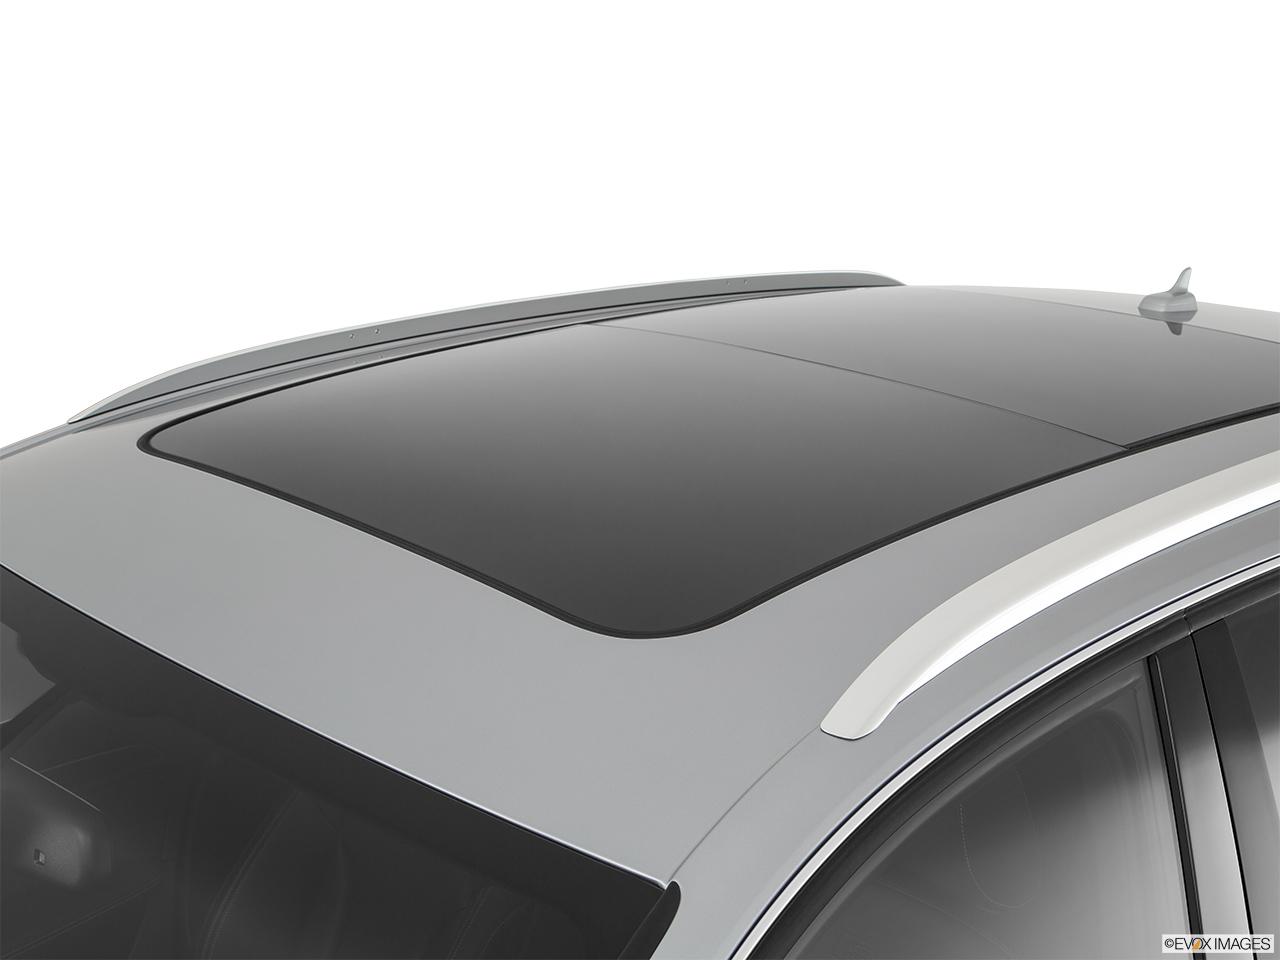 Audi Q5 Seating Capacity >> Car Pictures List for Audi Q5 2017 45 TFSI quattro 272 HP (UAE) | YallaMotor